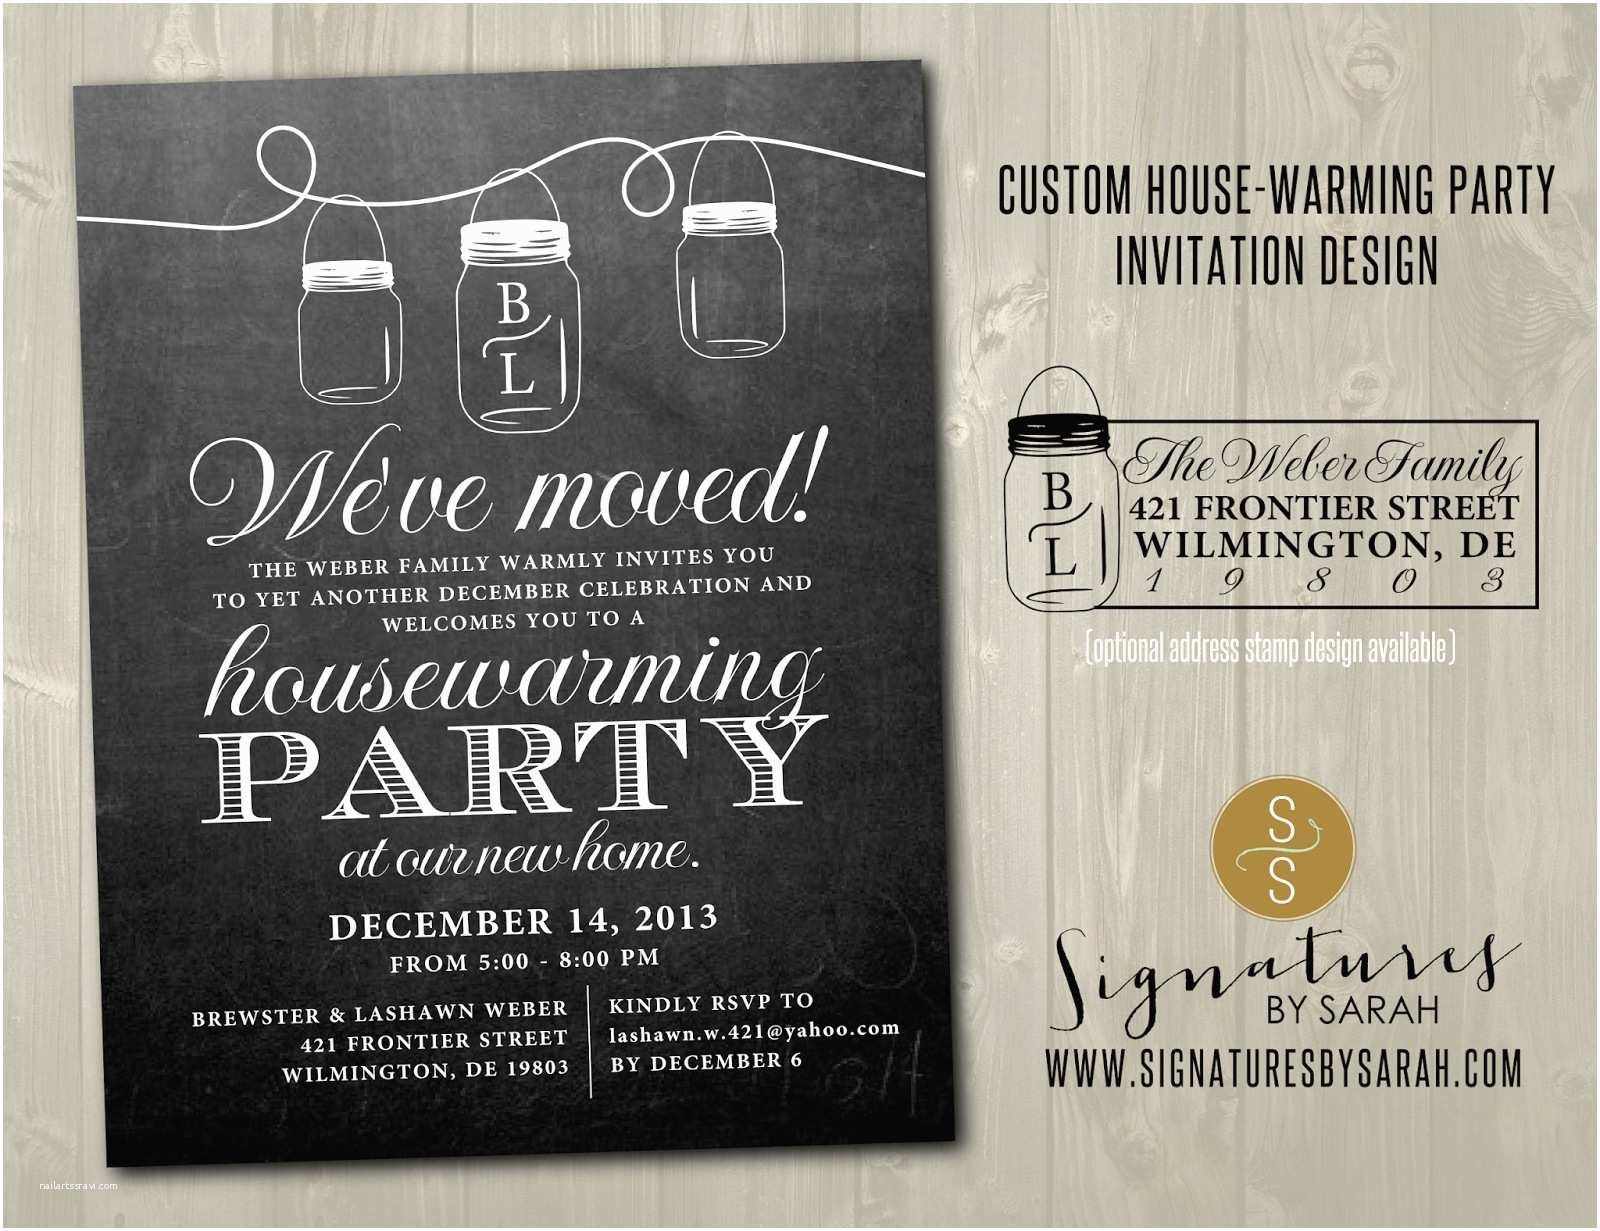 Housewarming Party Invitation Ideas Housewarming Party Invitation Wording Free Ideas